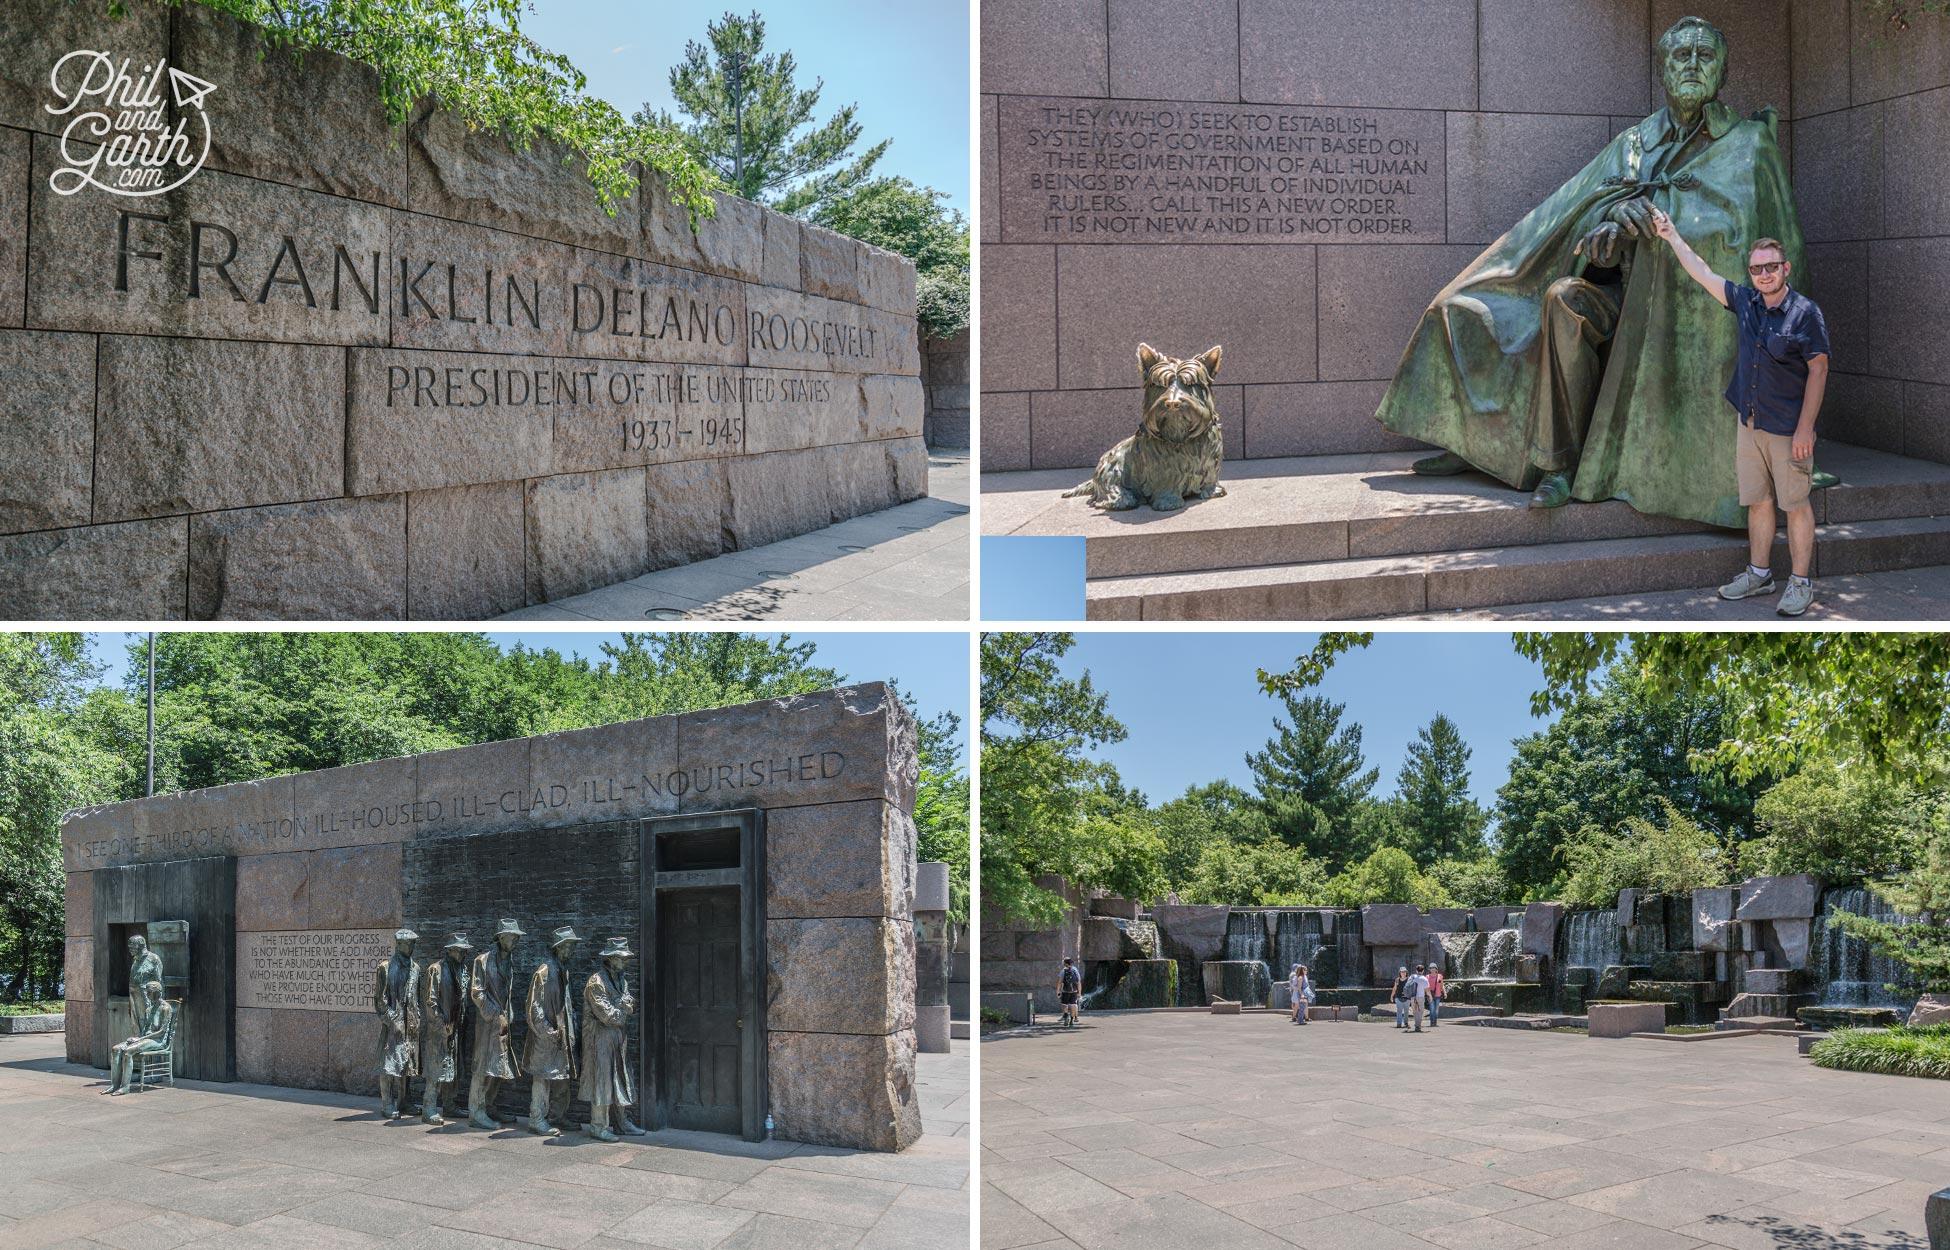 Garth at the Franklin D Roosevelt Memorial